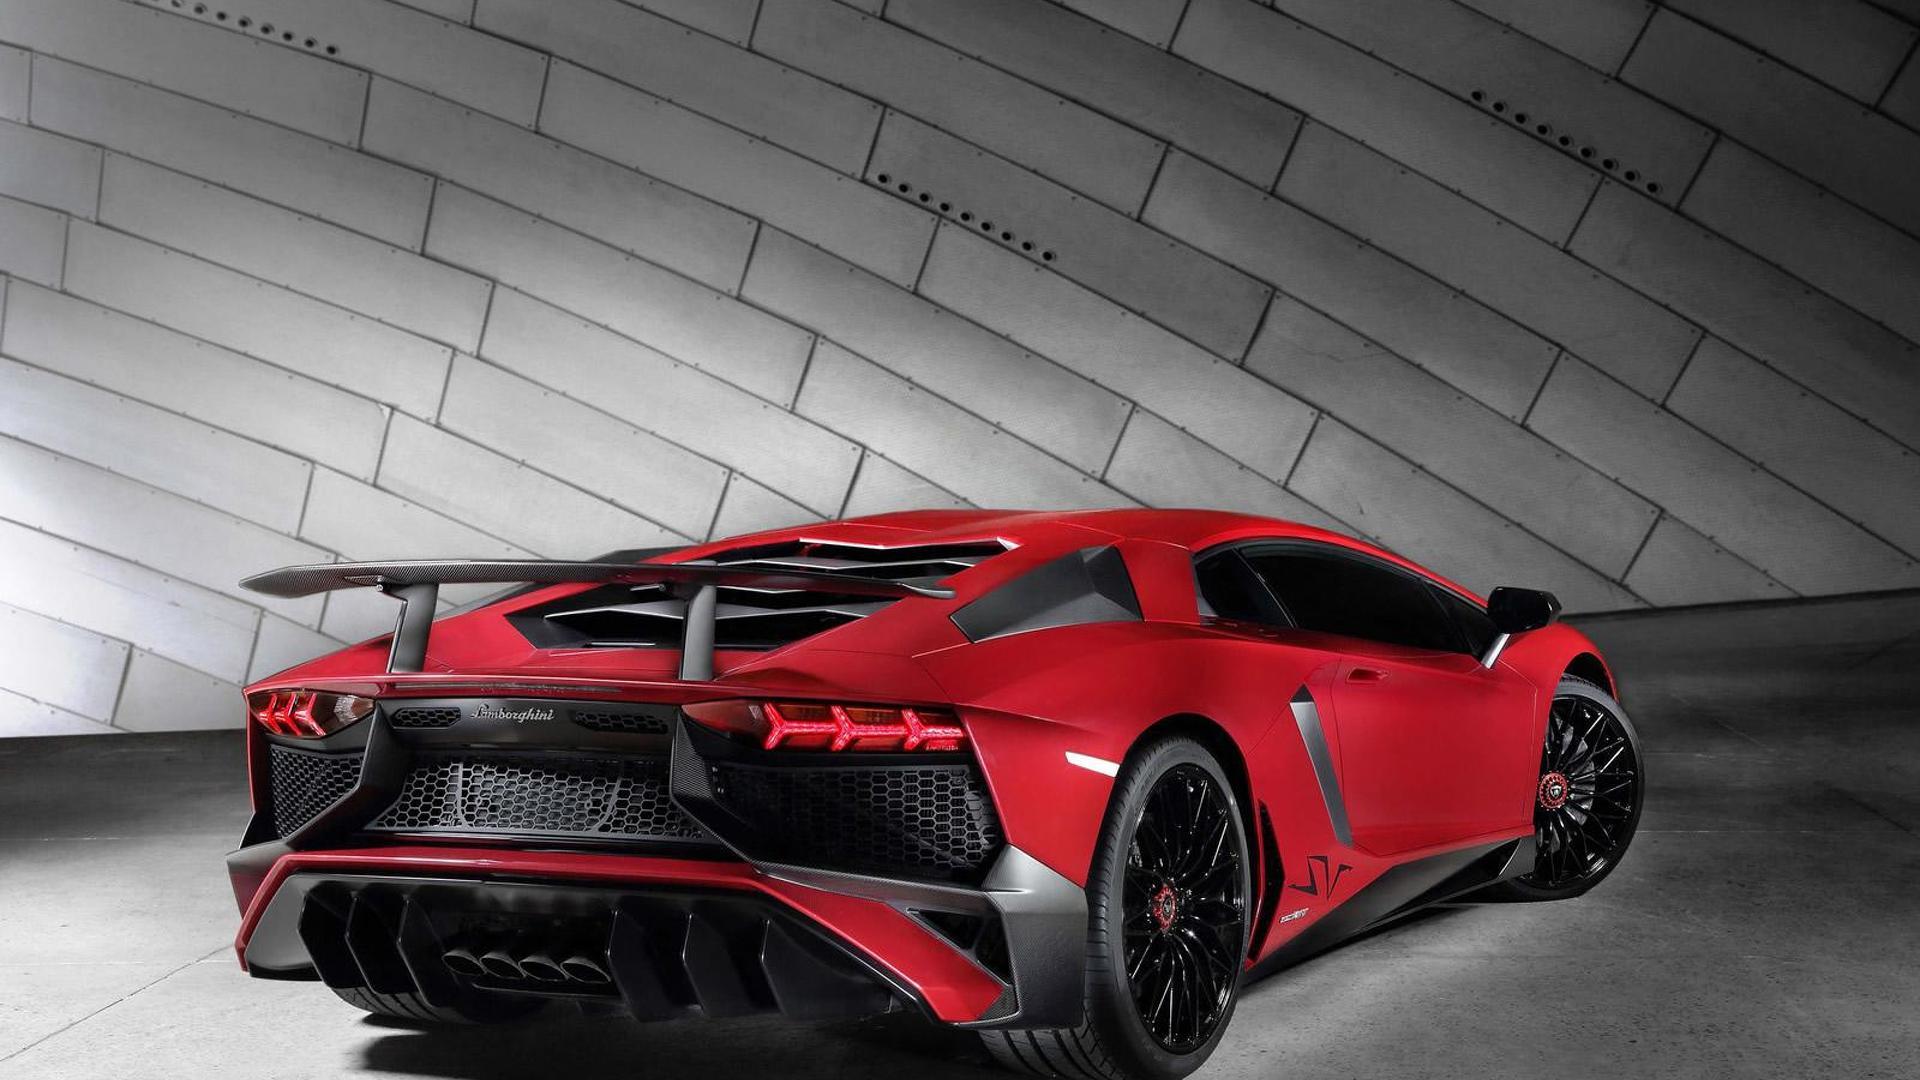 Lamborghini Aventador Sv Arrives In Us With 493069 Price Tag